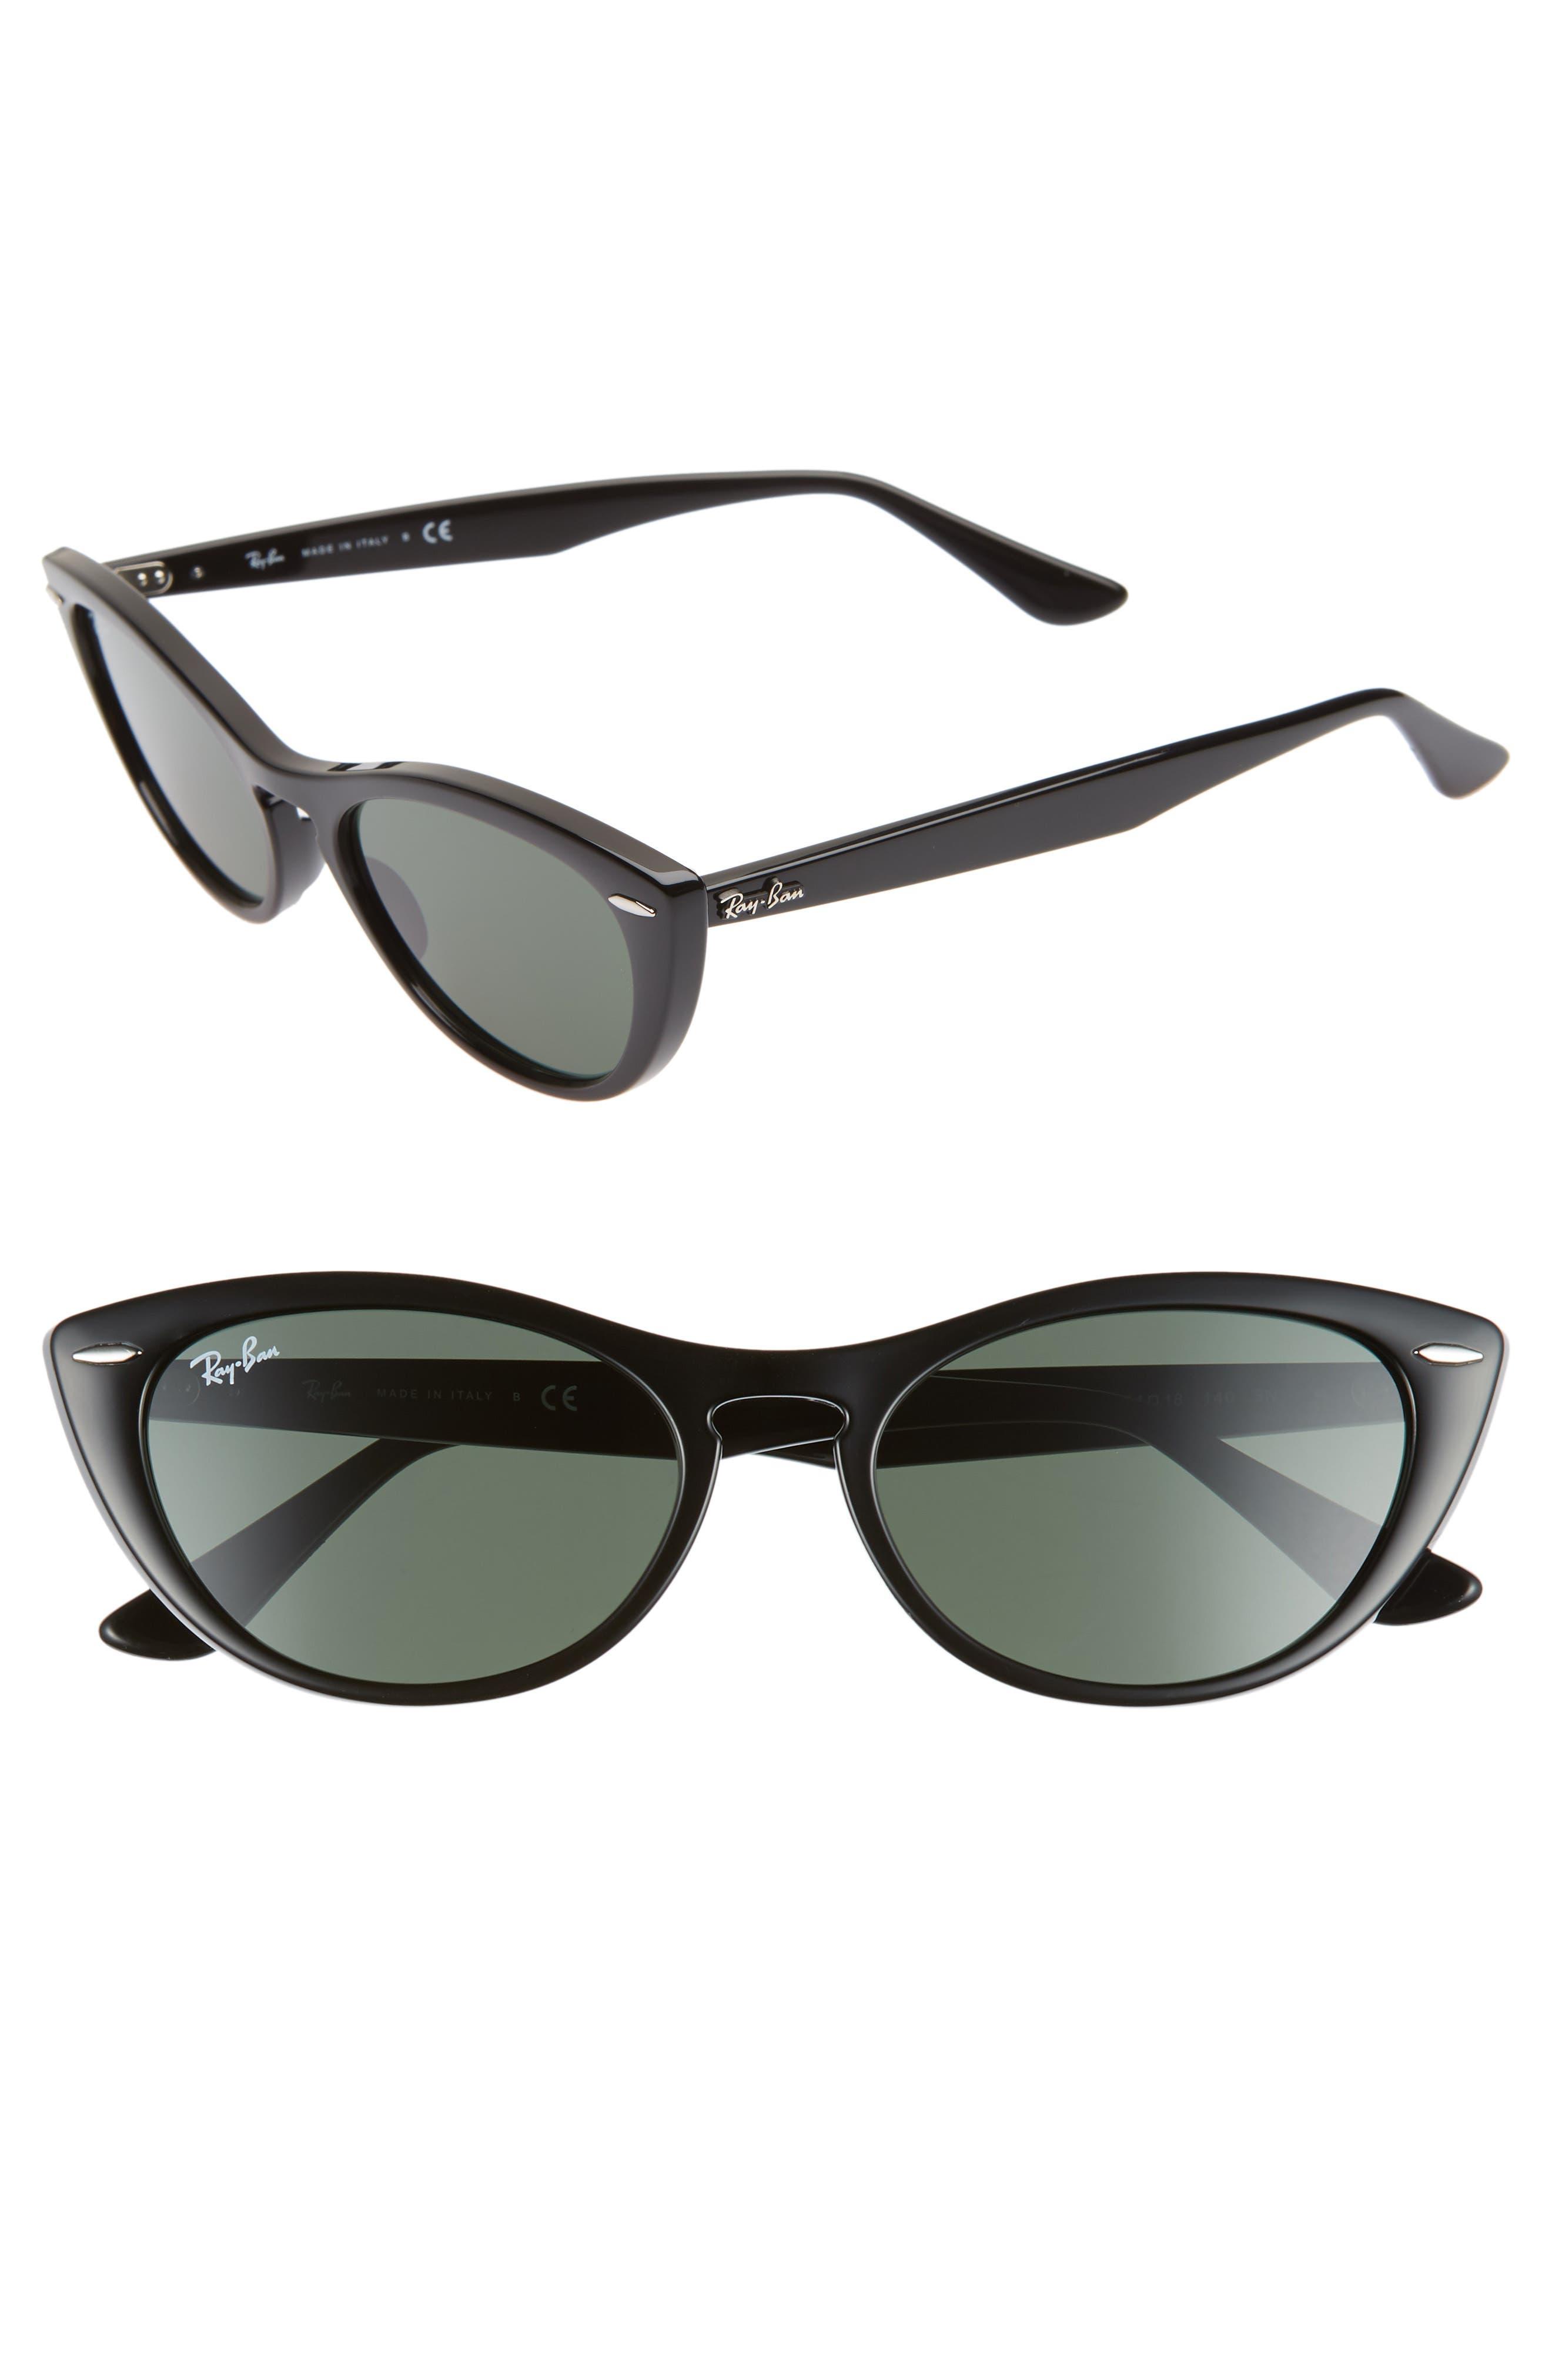 Ray-Ban Nina 5m Cat Eye Sunglasses - Havana/ Brown Solid